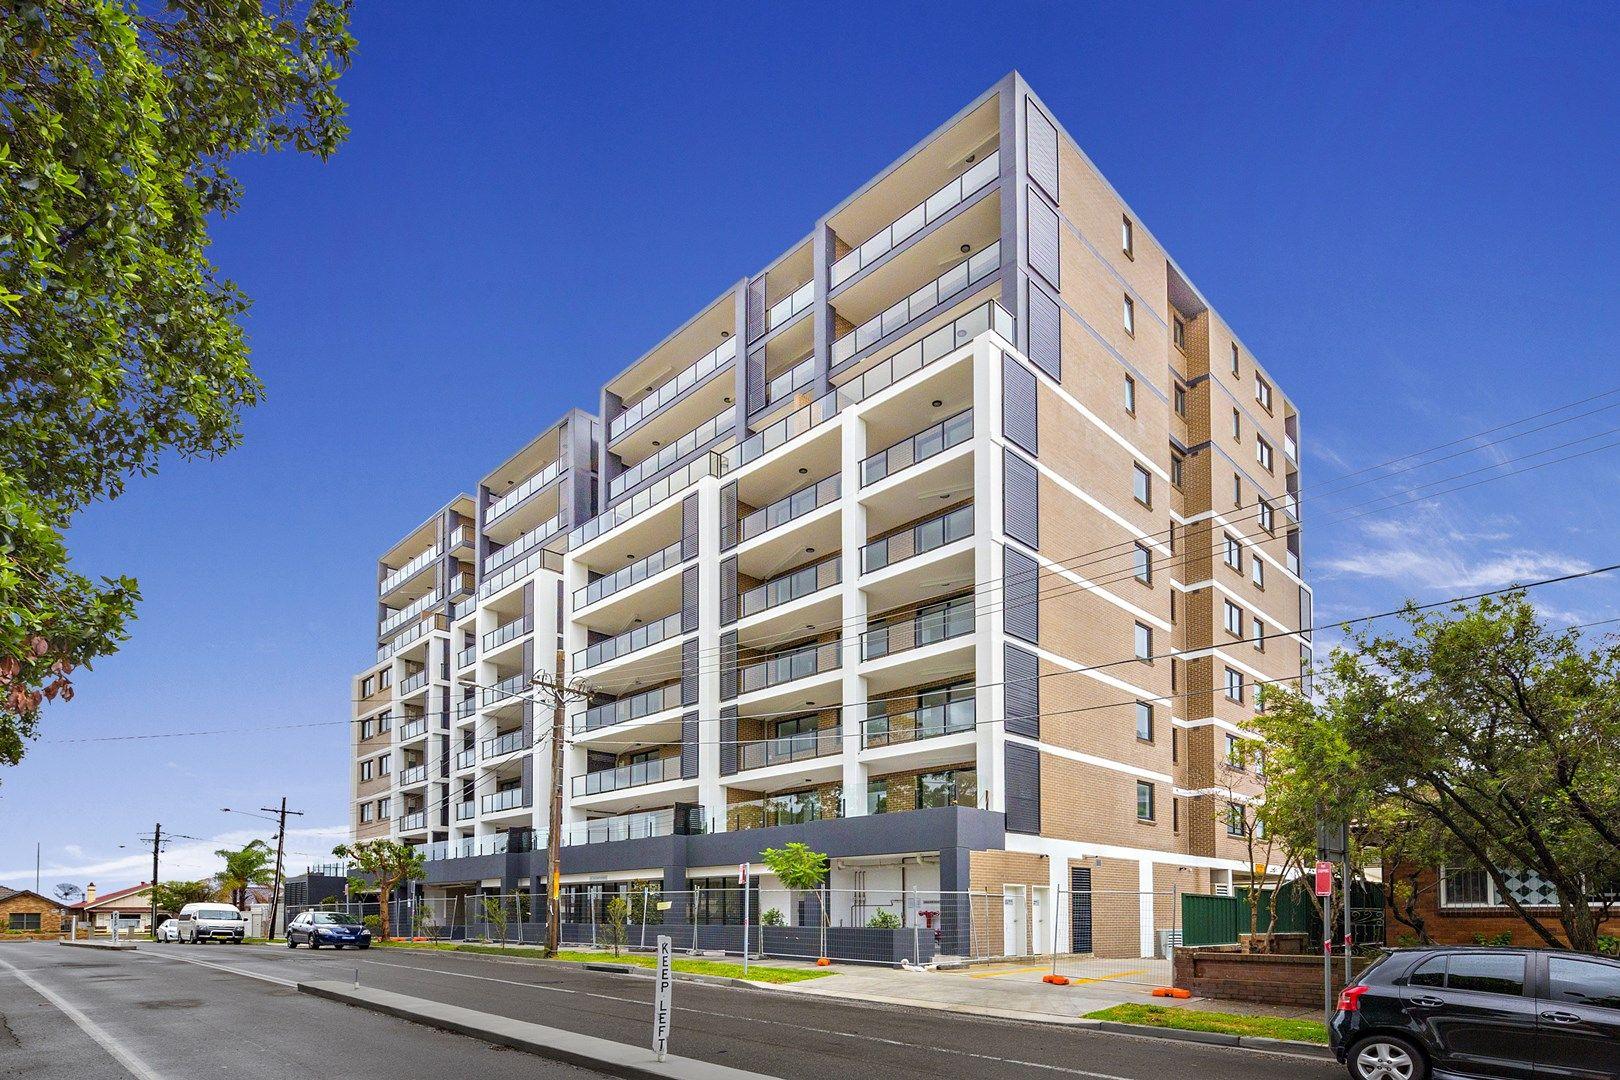 65/27-29 Mary  Street, Auburn NSW 2144, Image 0